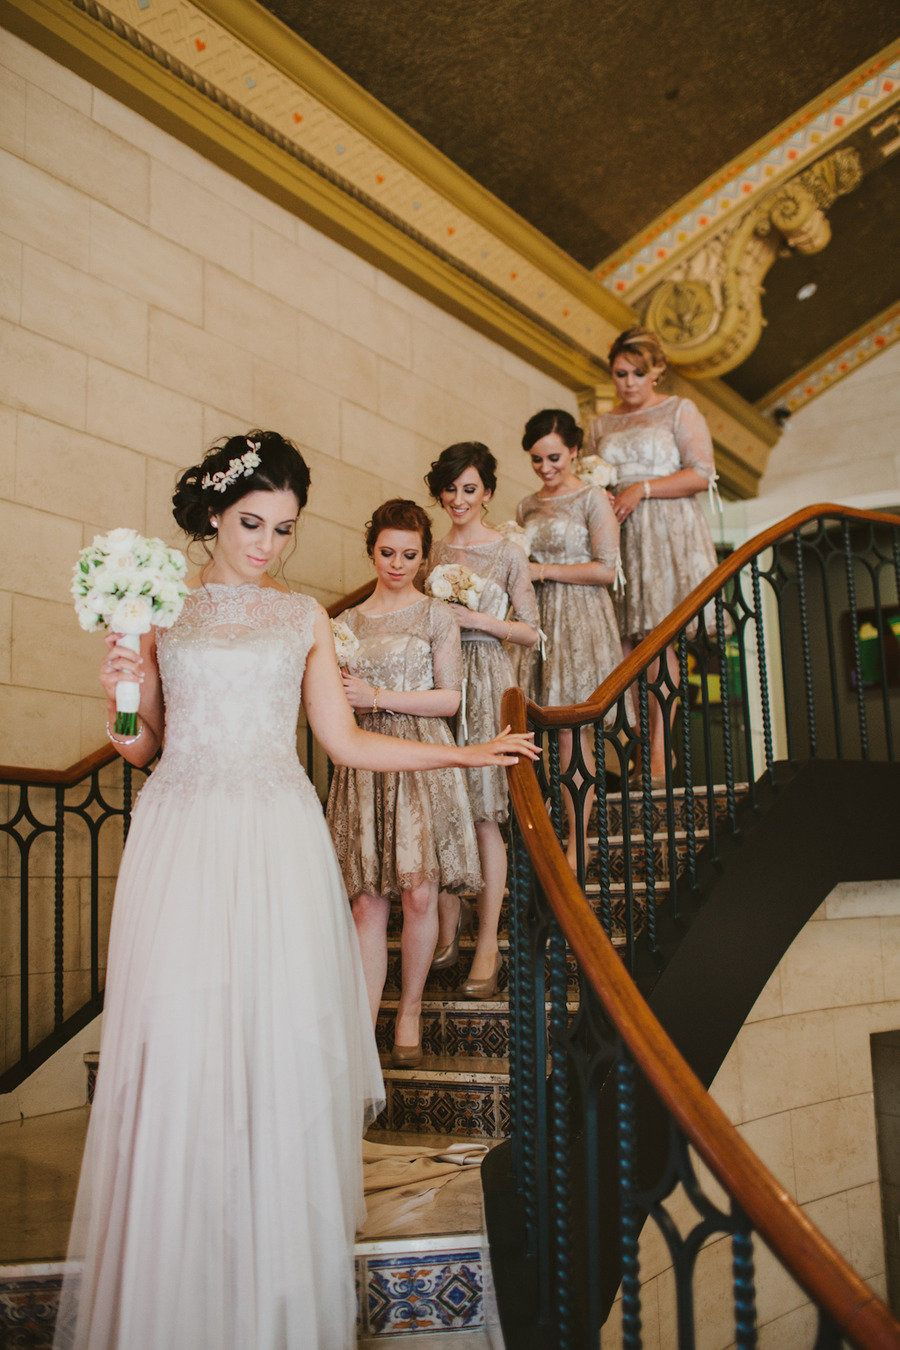 Vintage + Bohemian Chic Melbourne Wedding from Luma Photo